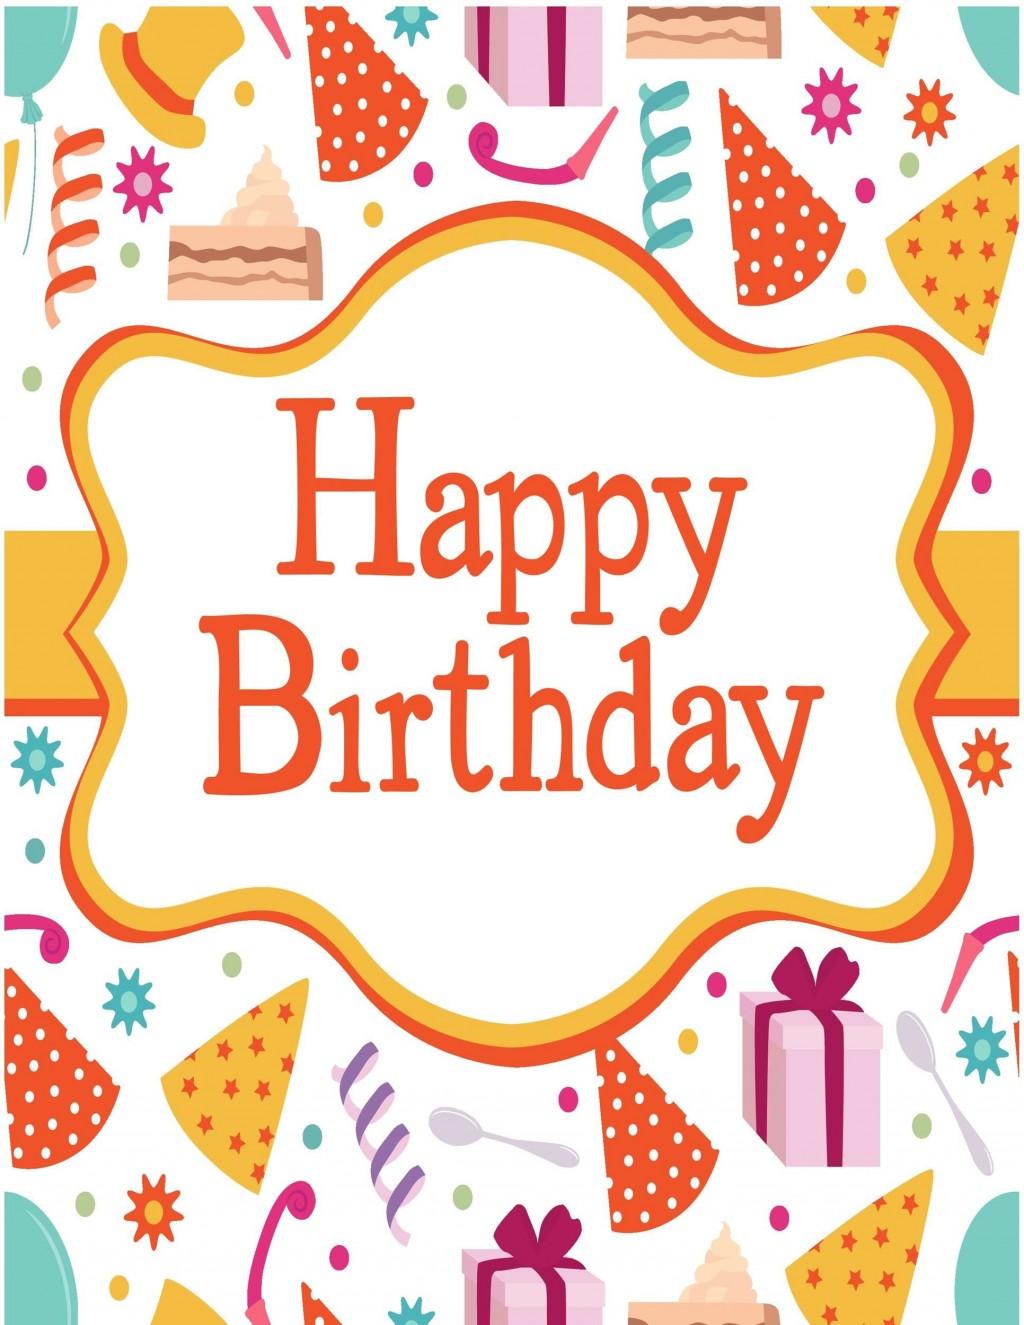 007 Best Birthday Card Template Free Design  Invitation Photoshop Download WordLarge